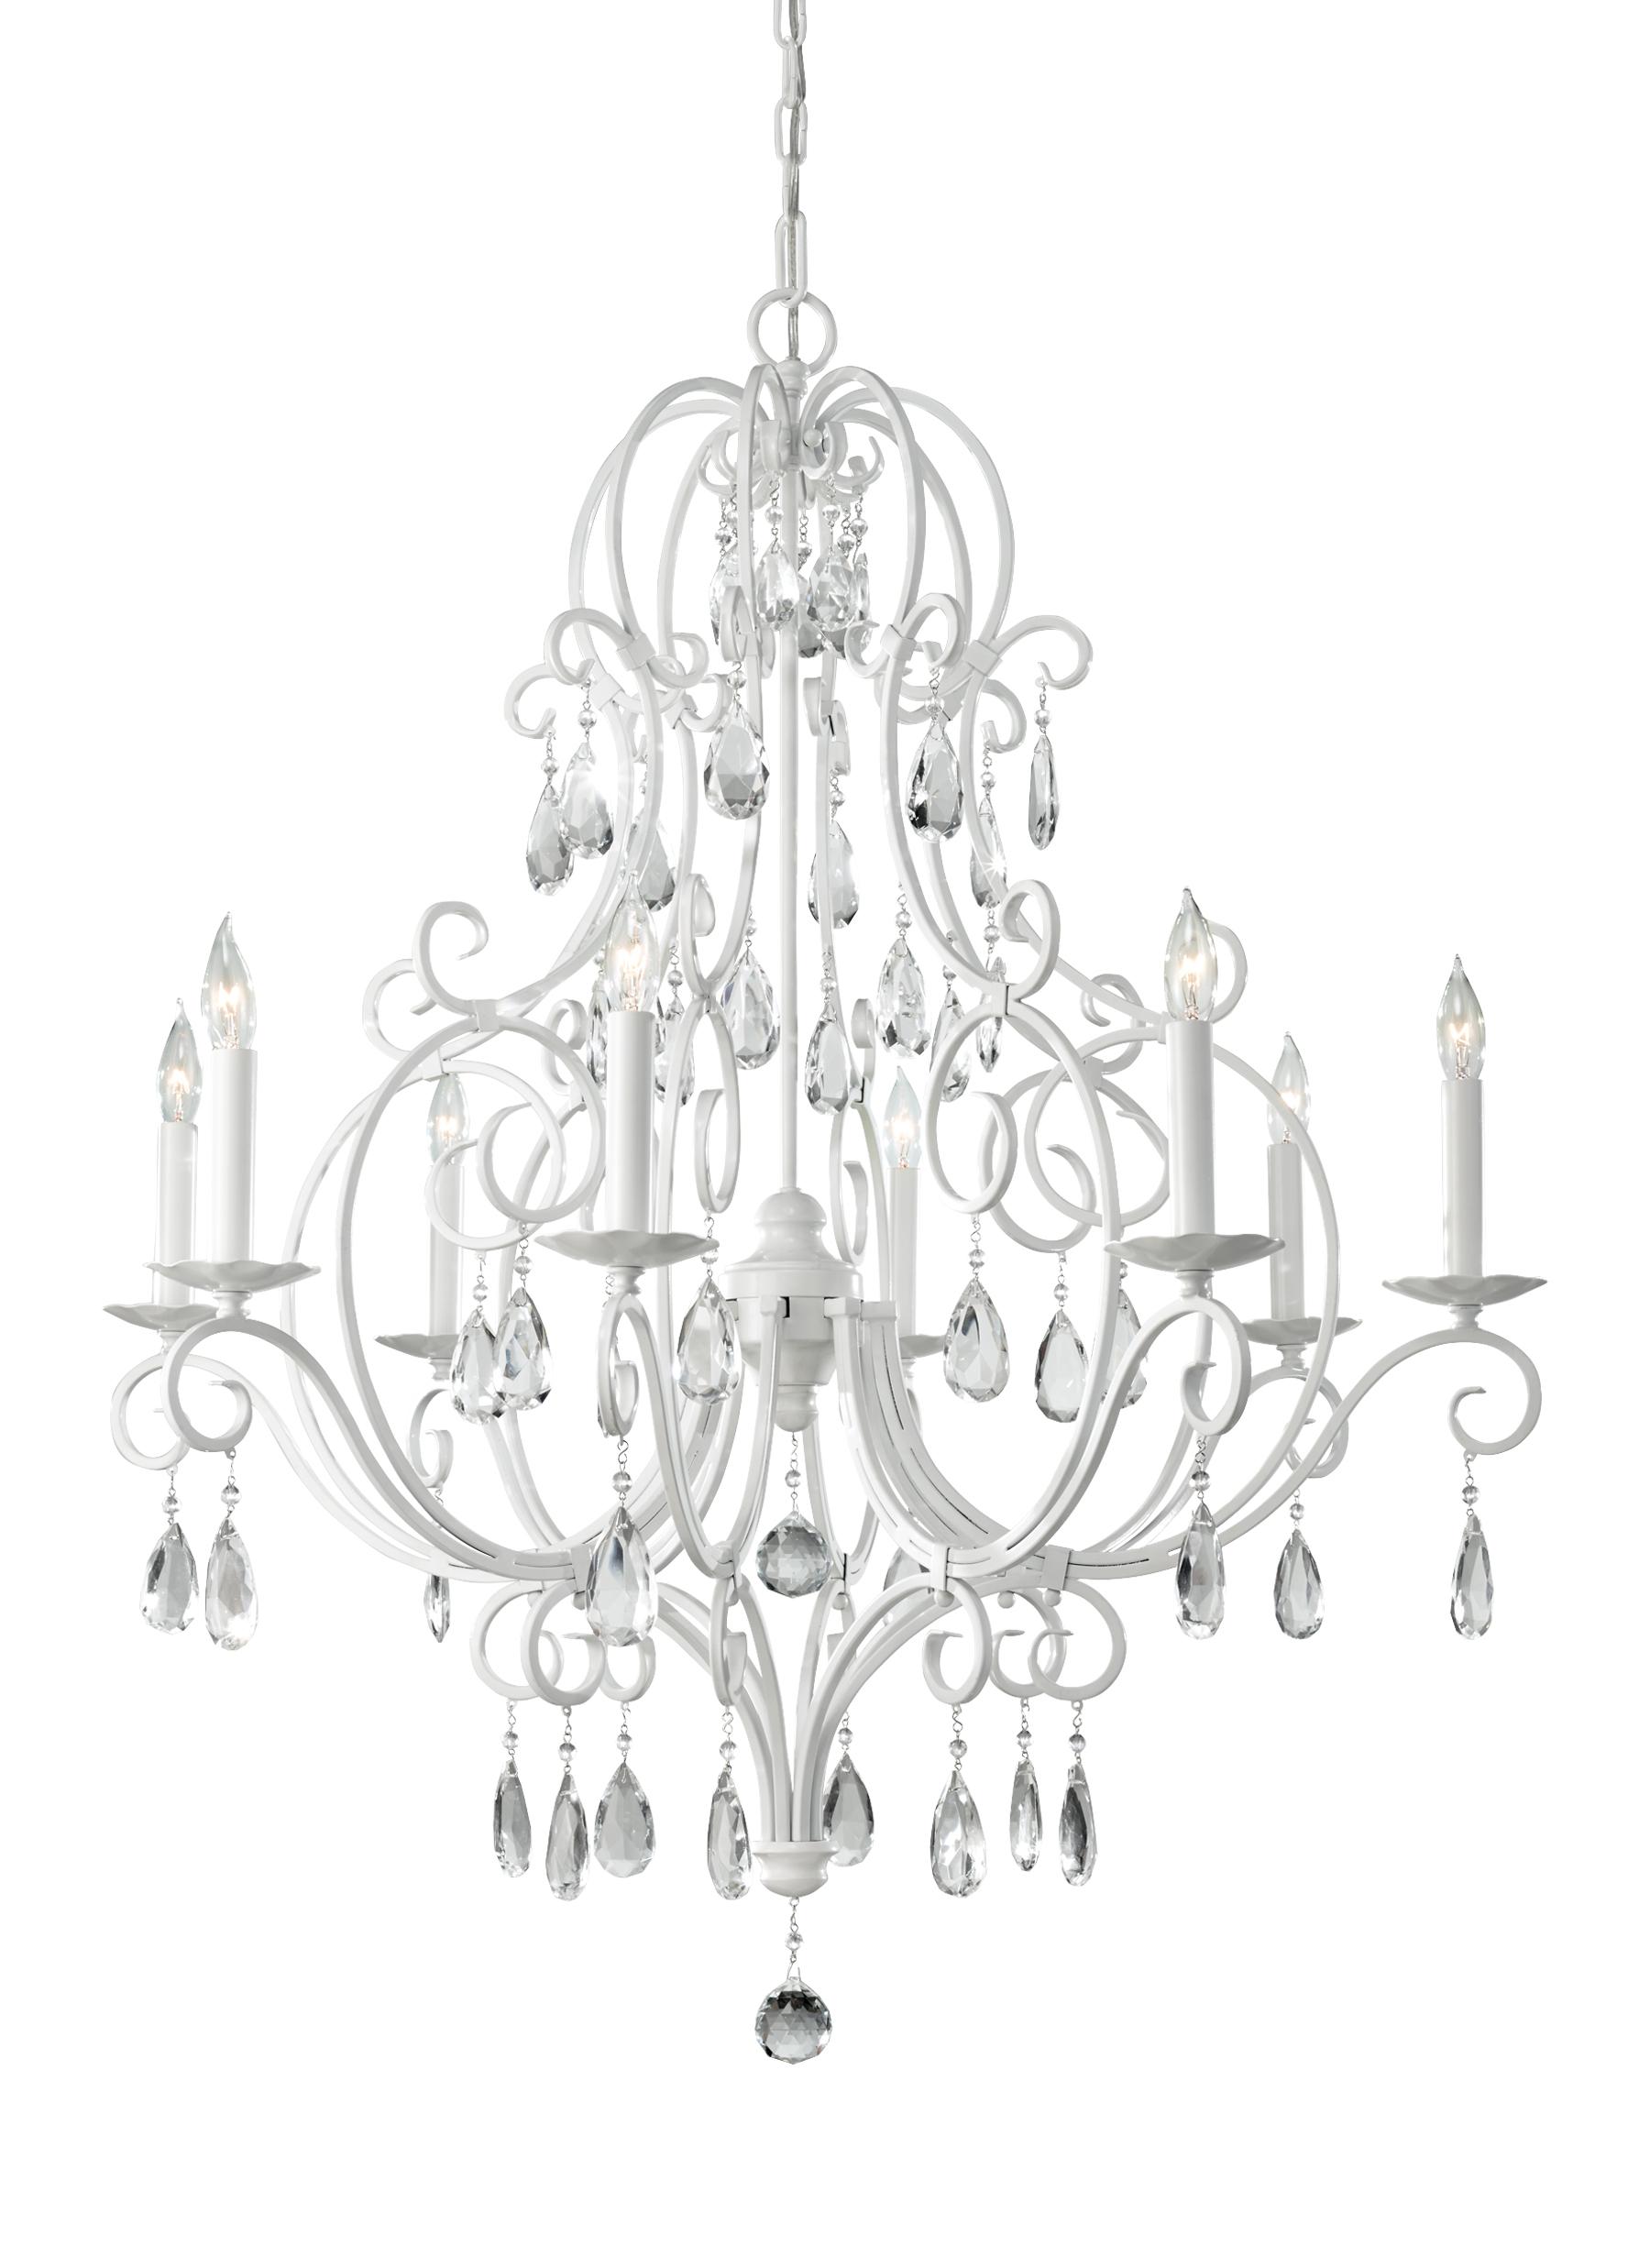 F23038sgw8 light single tier chandelier semi gloss white loading zoom arubaitofo Choice Image